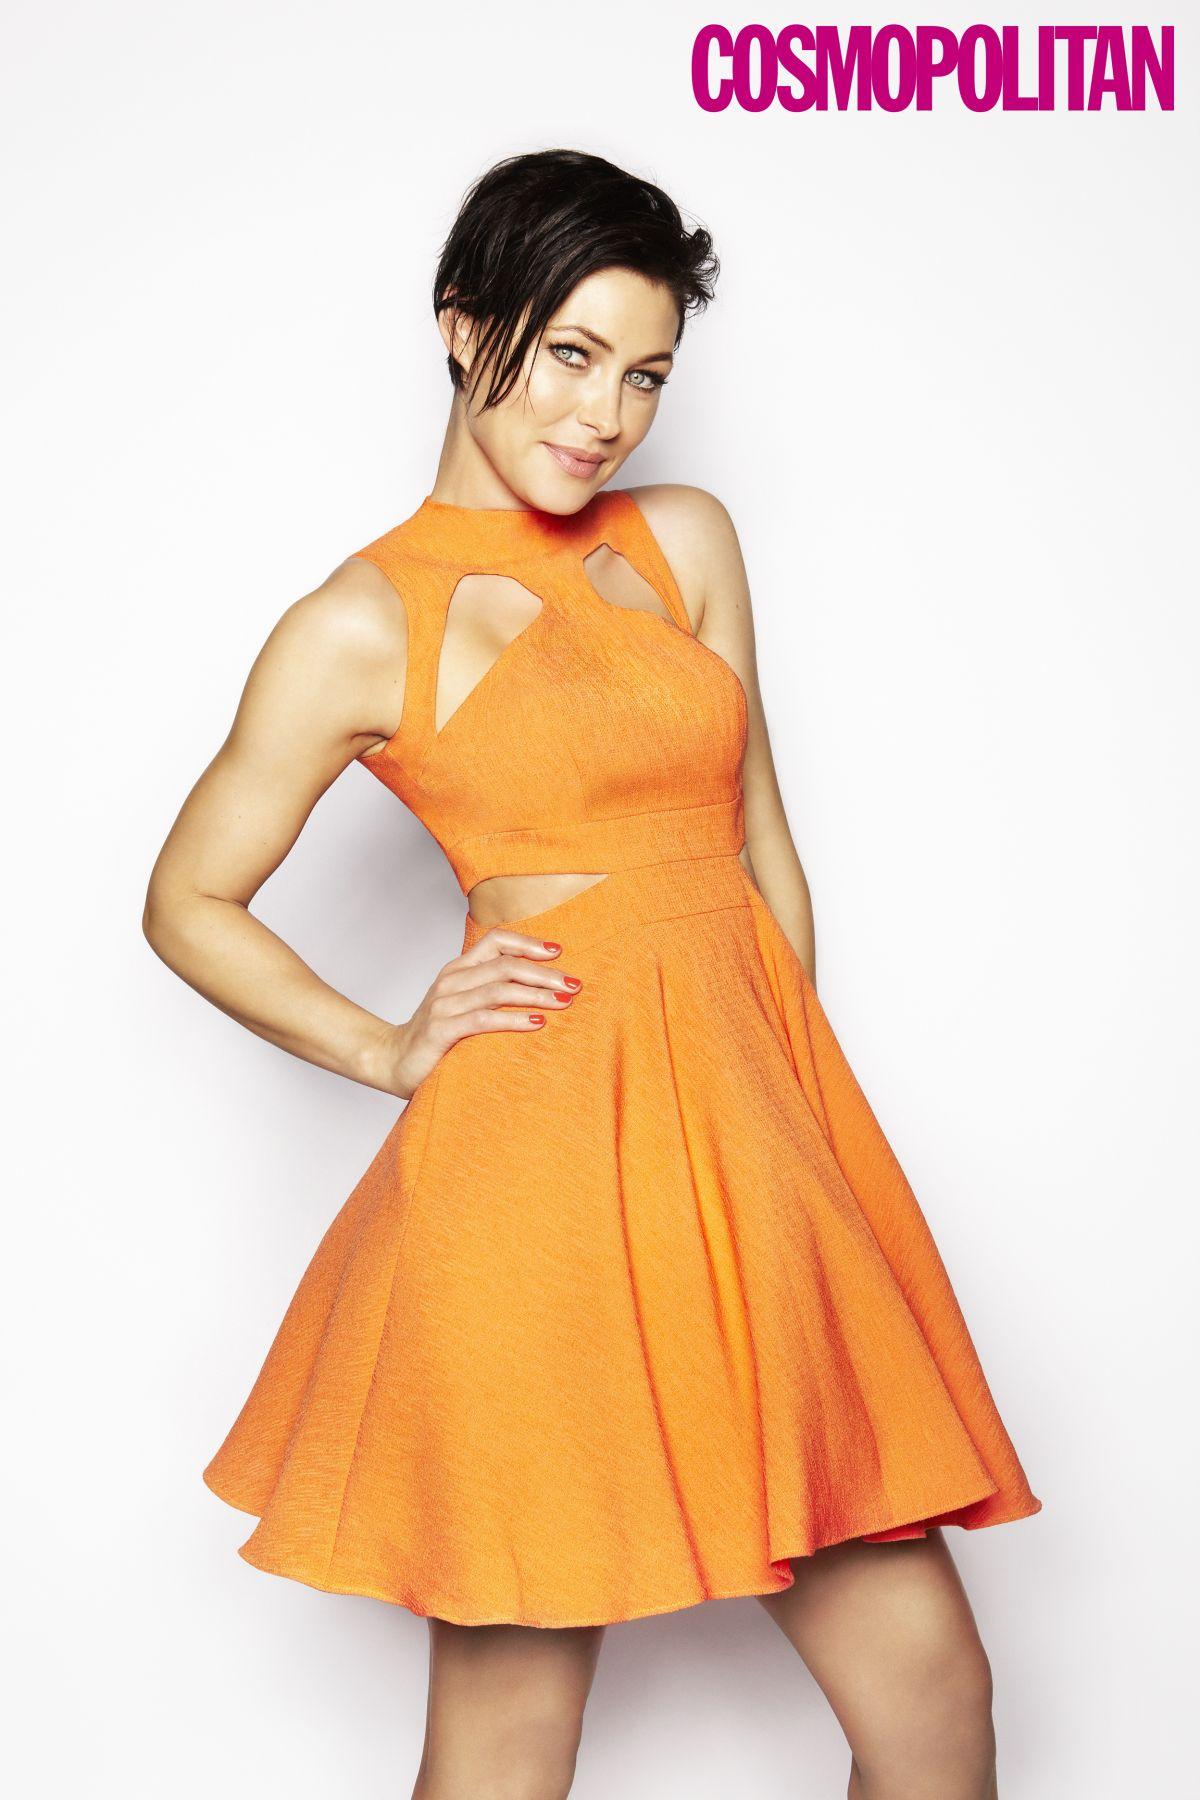 EMMA WILLIS for Cosmopolitan Magazine